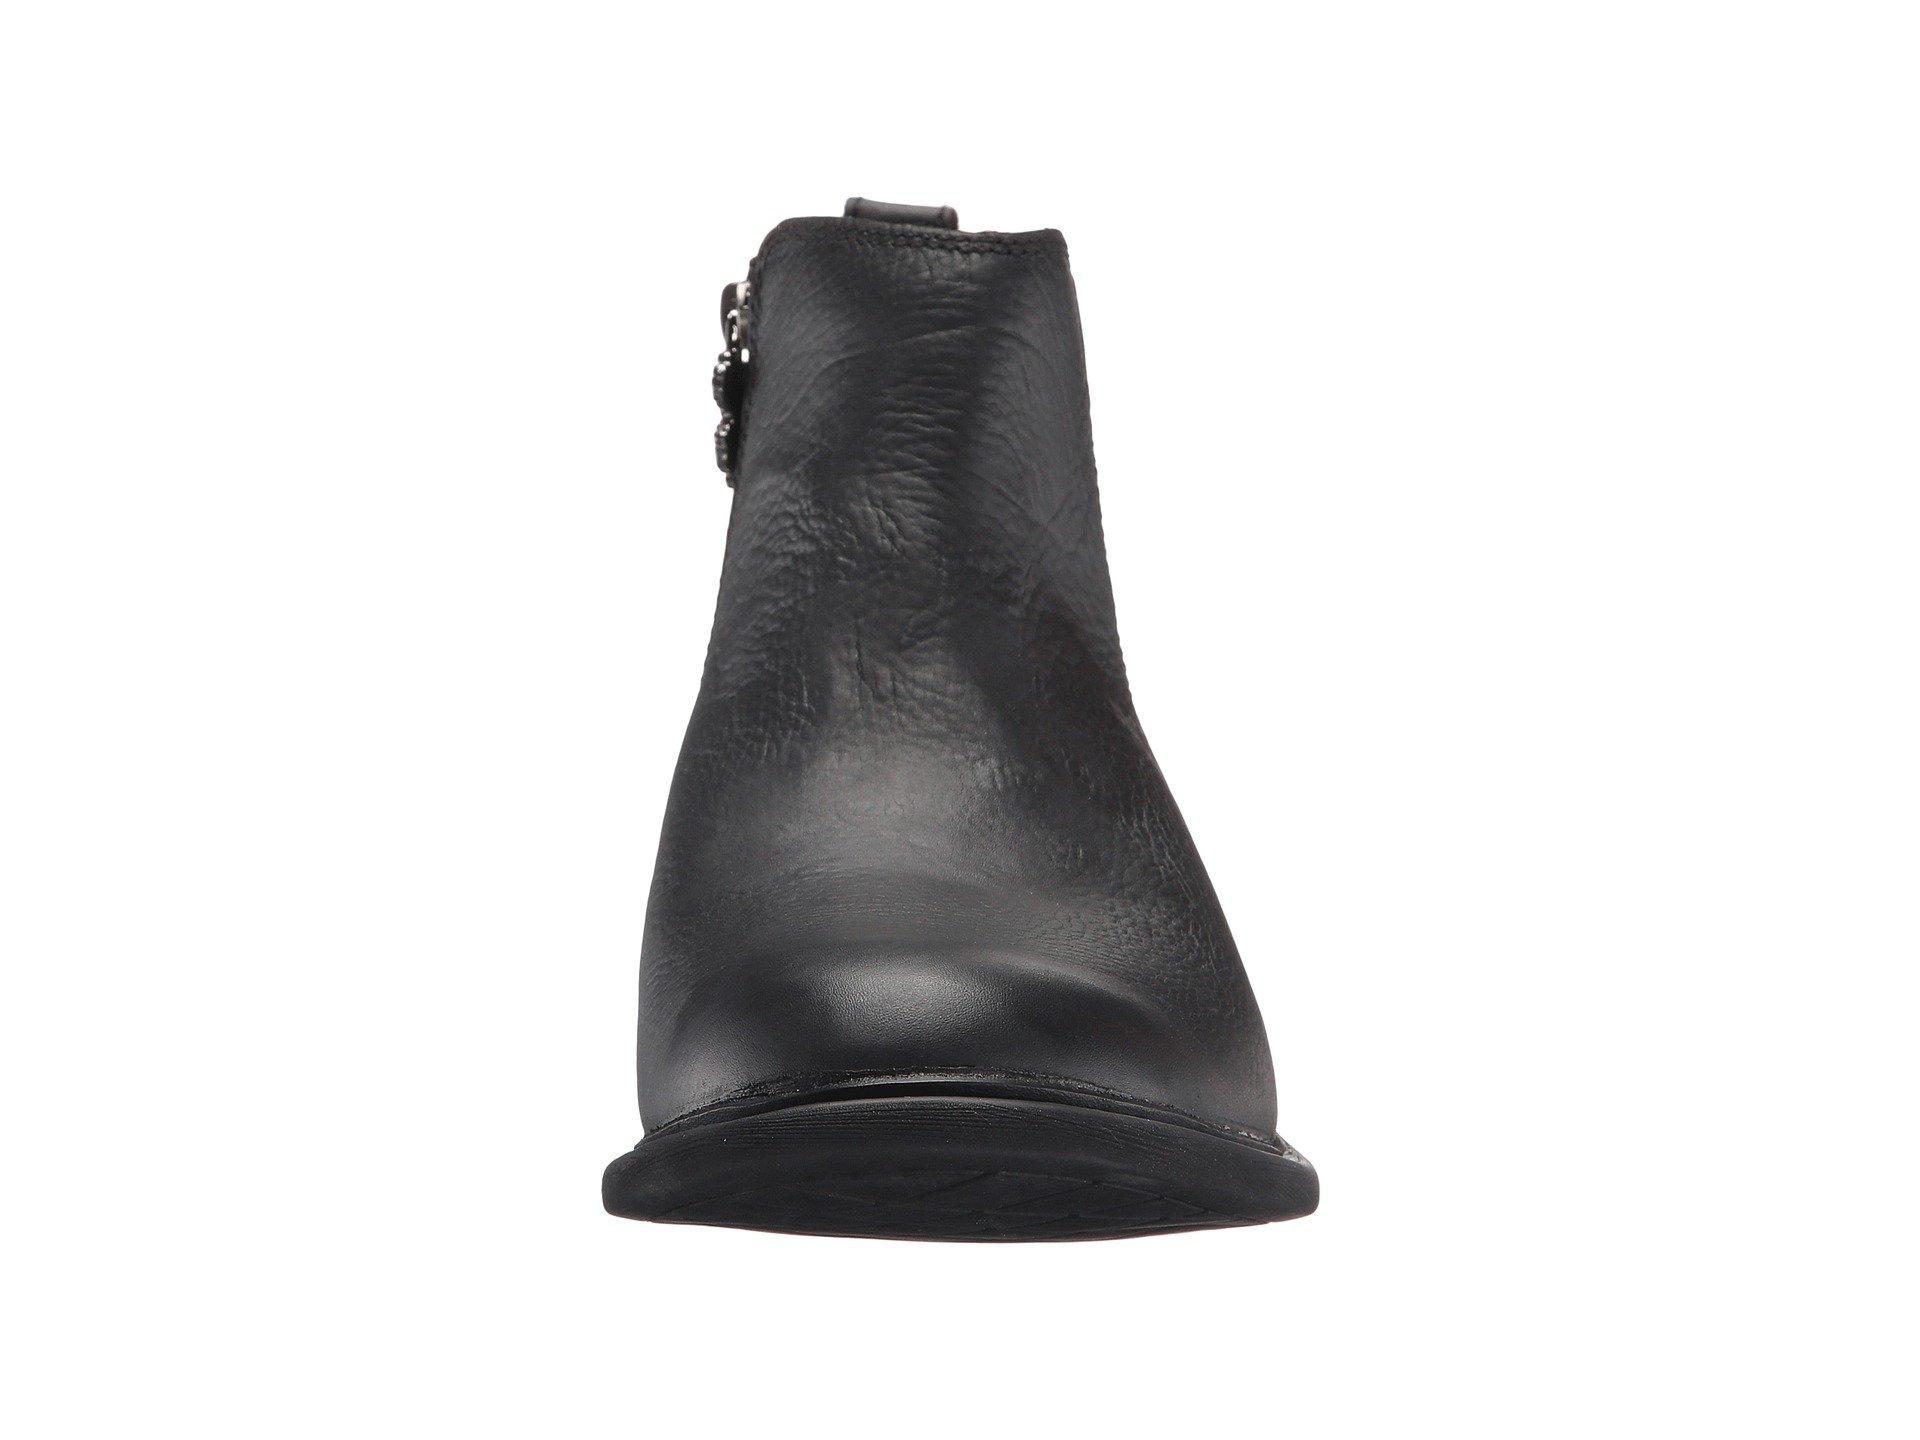 nason single men You read it right we've got mark nason - traditional dress - lasky (black) men's shoes for $13000.